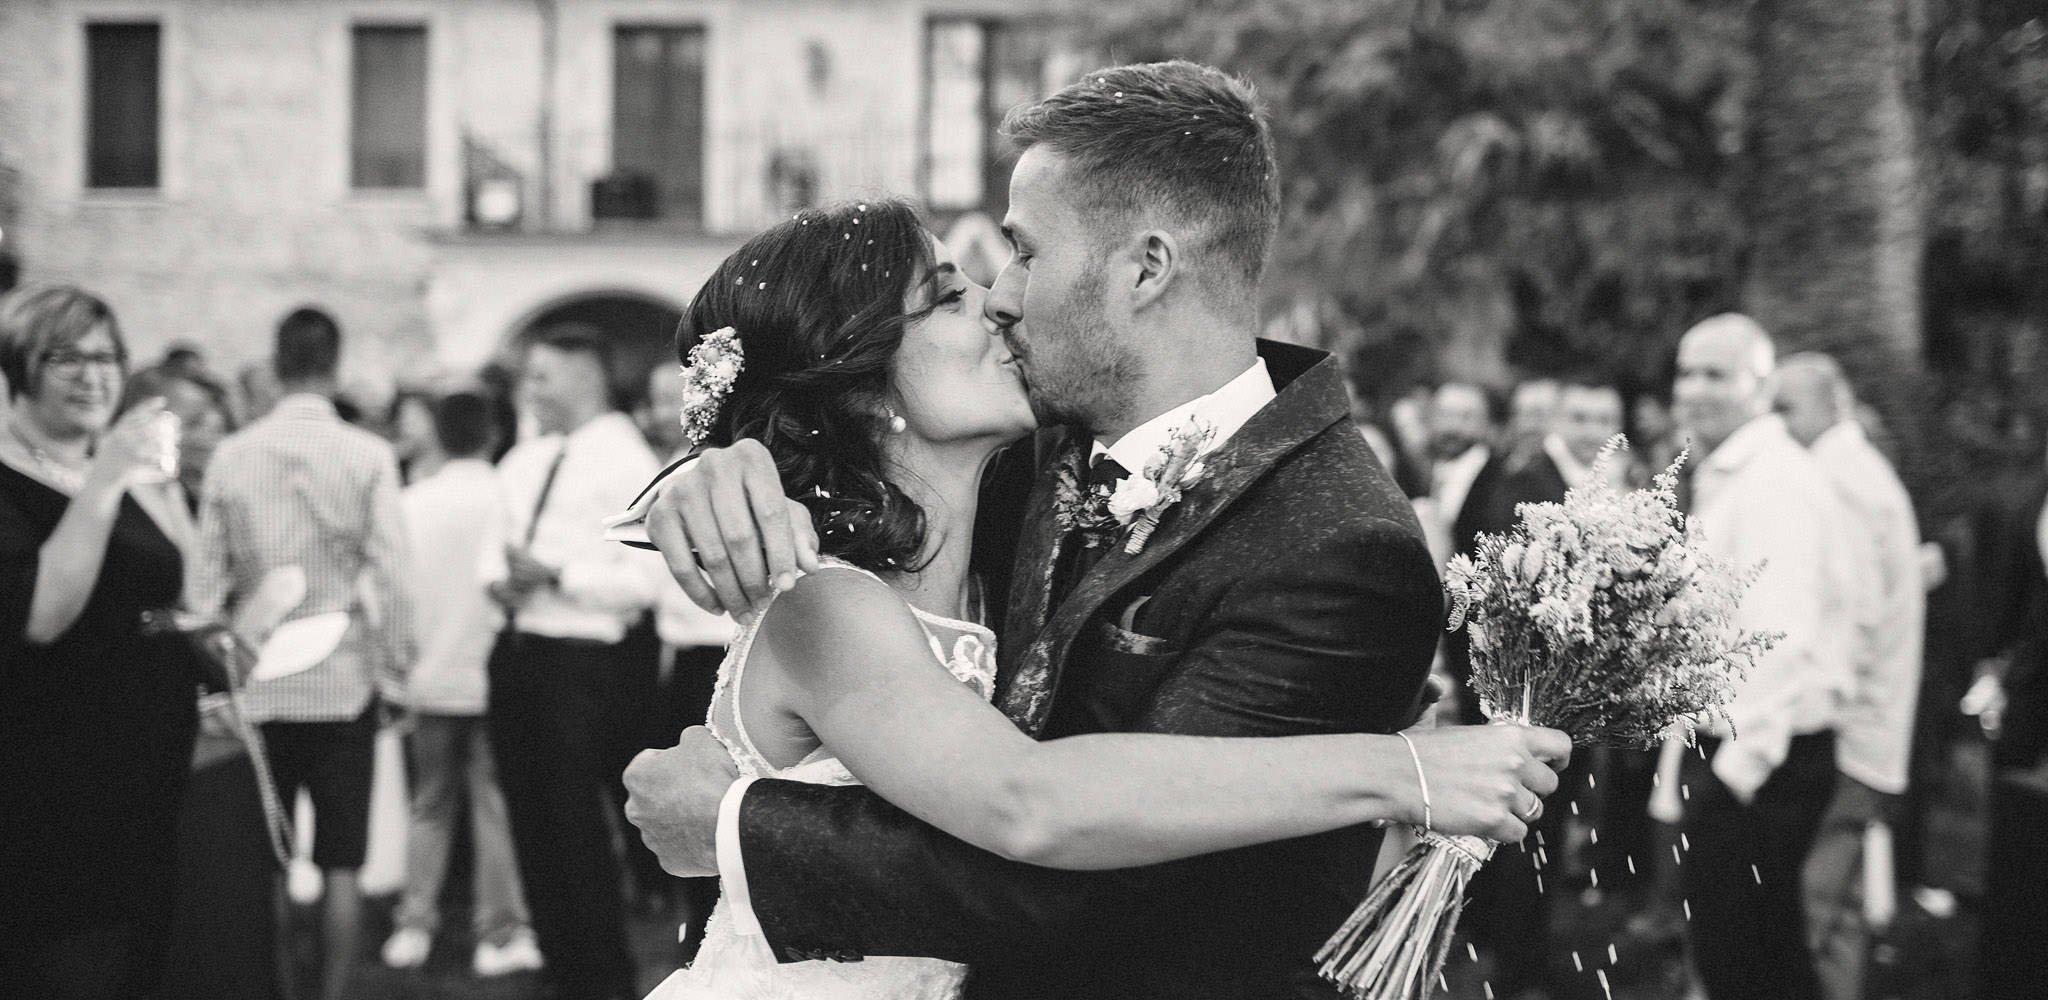 Ruben y Leiken pedro talens fotografo de bodas en valencia